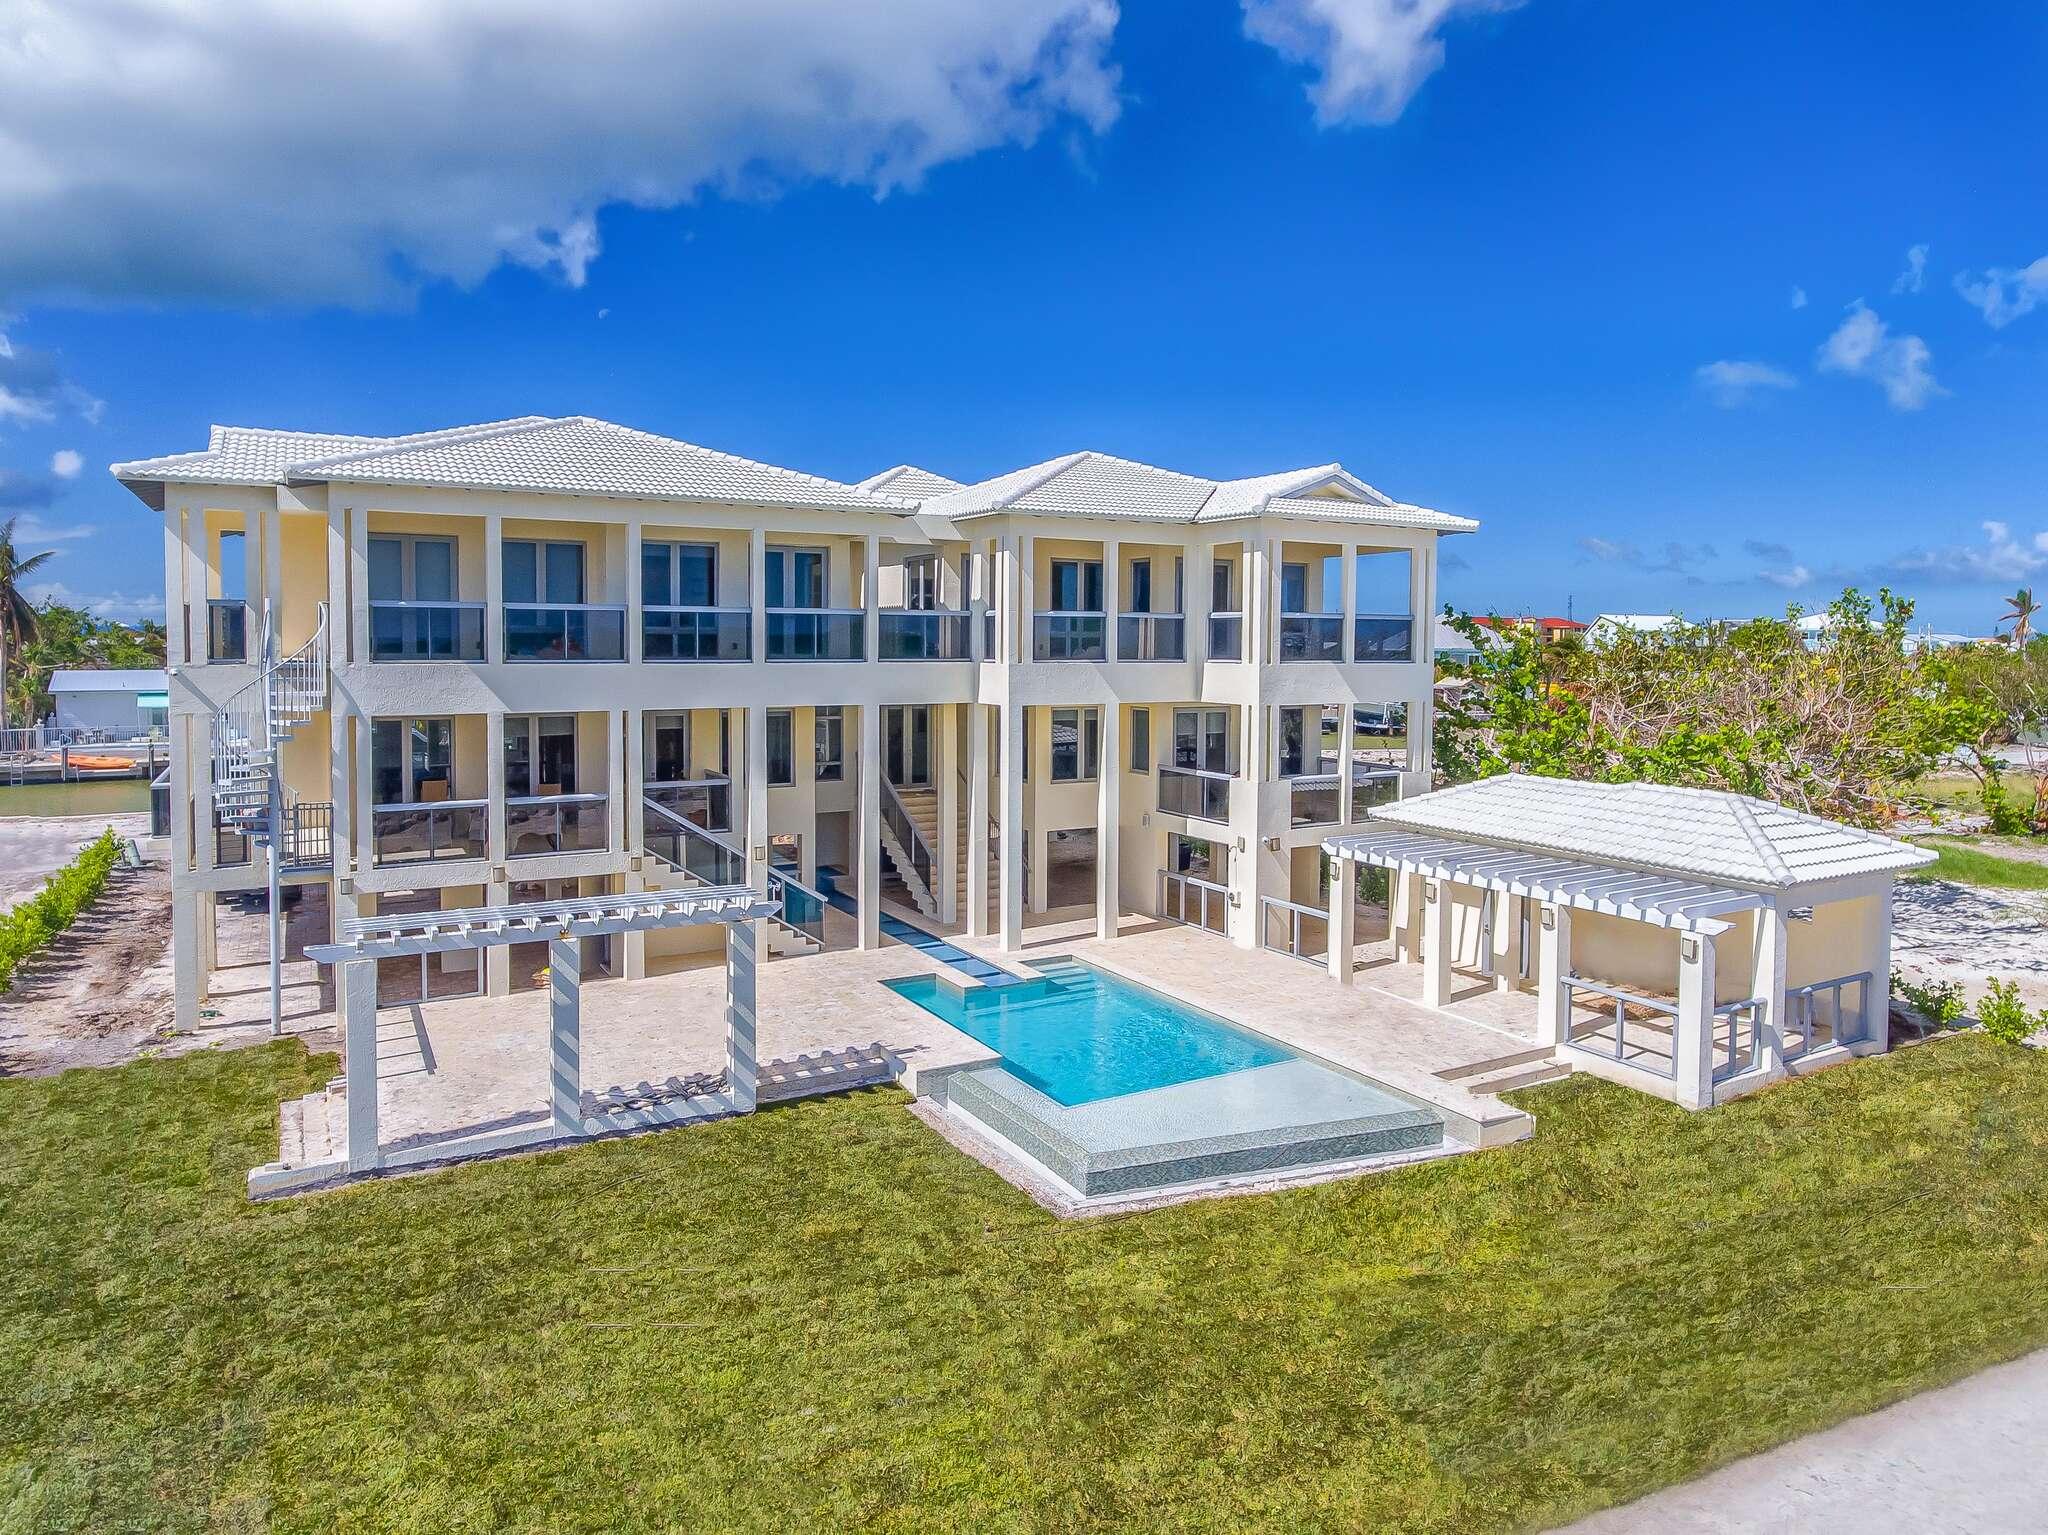 Single Family for Sale at 124 Sunrise Drive Marathon, Florida 33050 United States